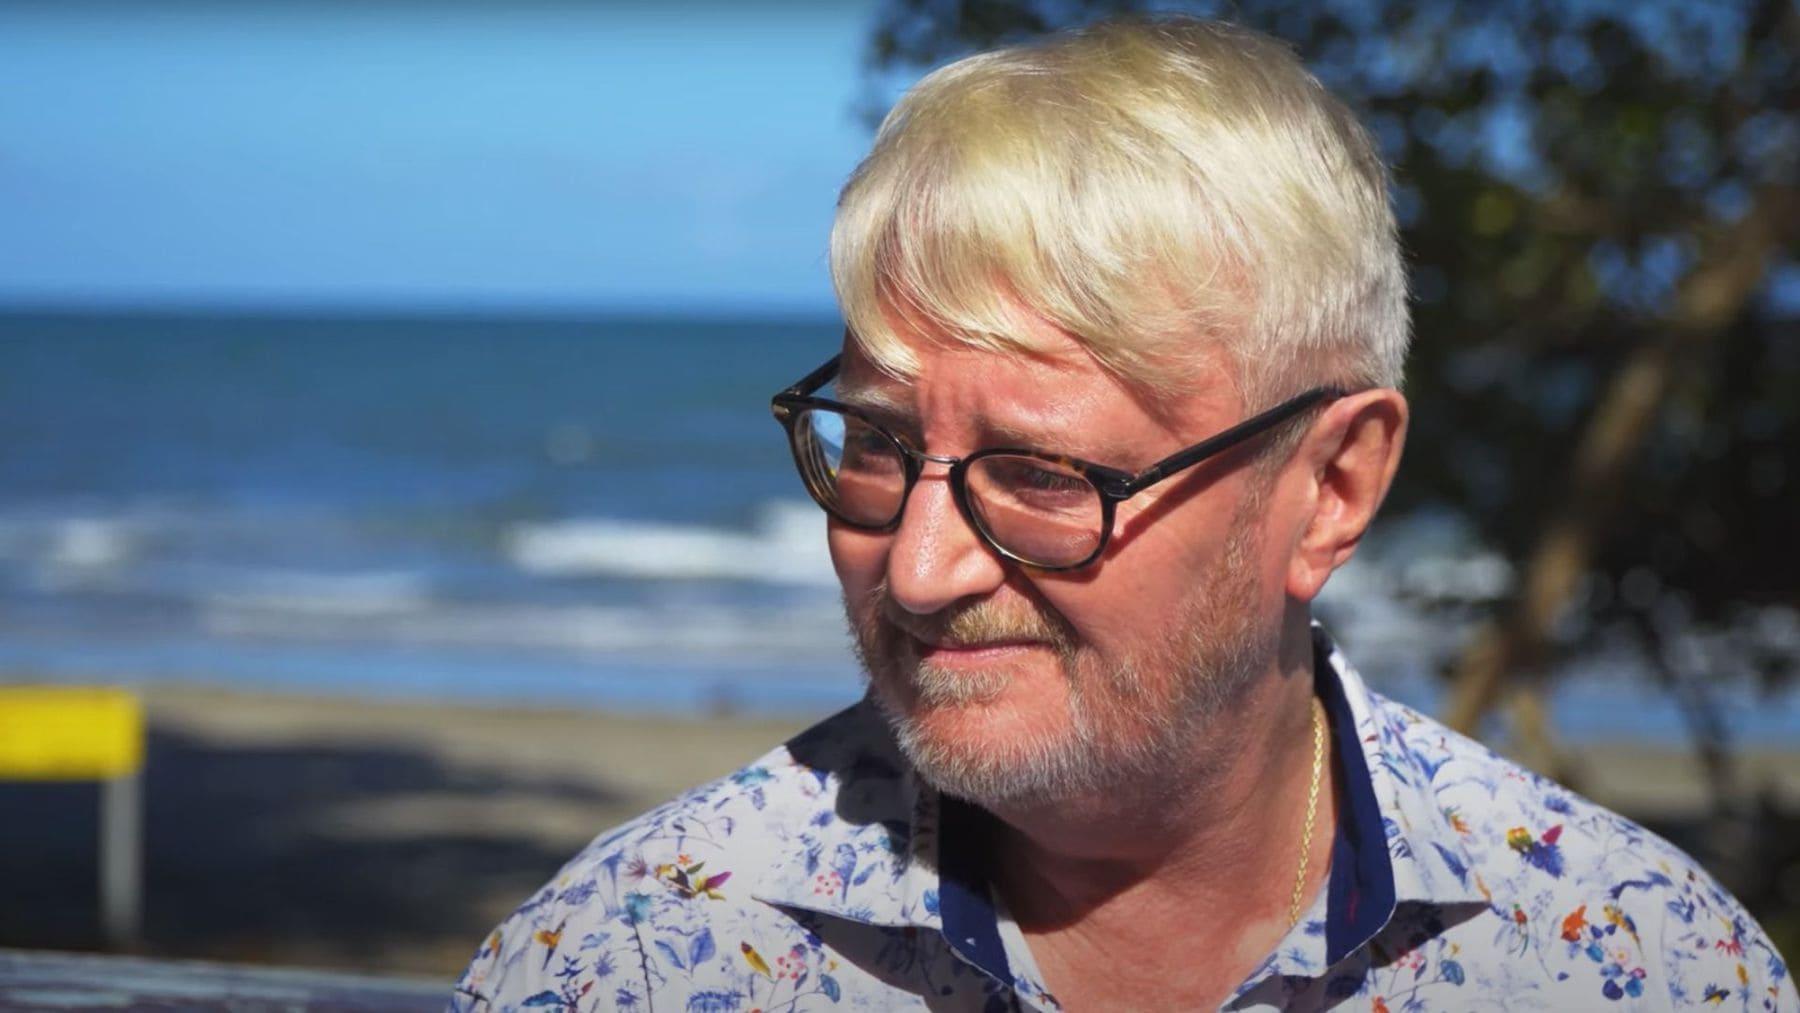 G'day Port Douglas Daintree - Meet Jason and his beachside dream